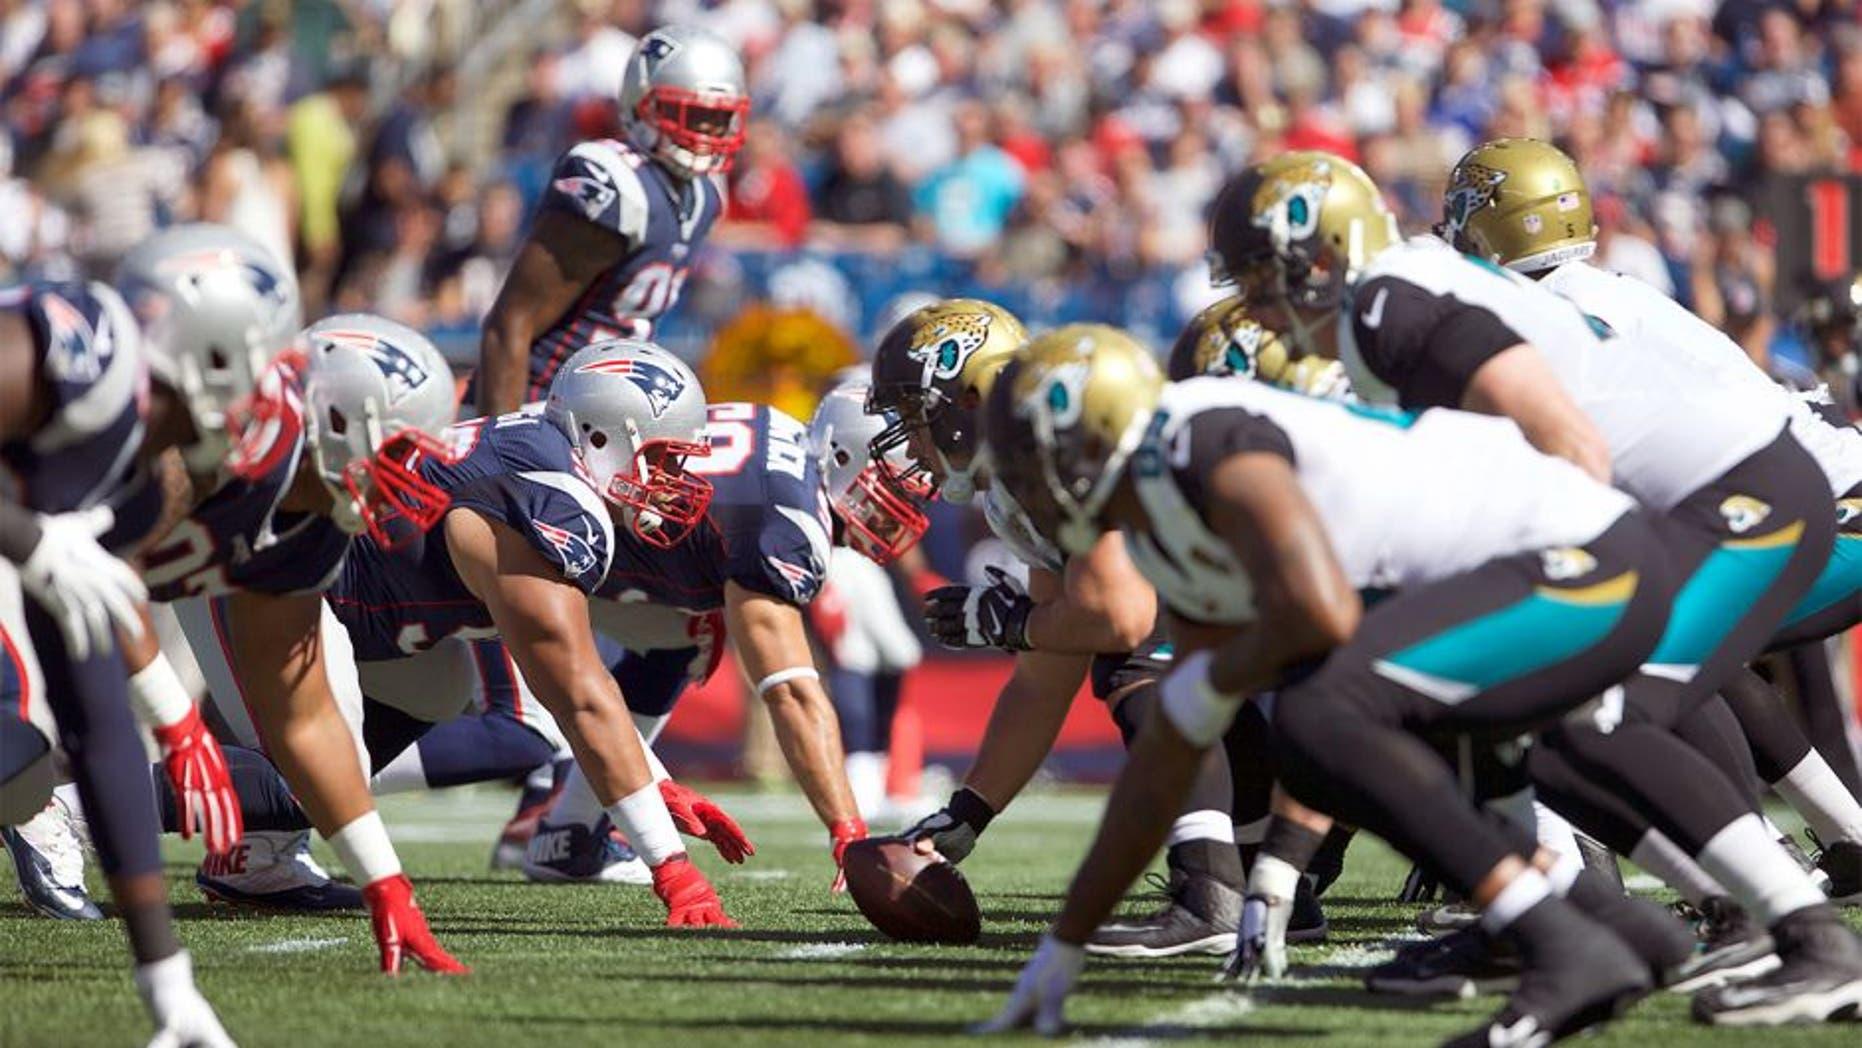 Sep 27, 2015; Foxborough, MA, USA; The Jacksonville Jaguars take on